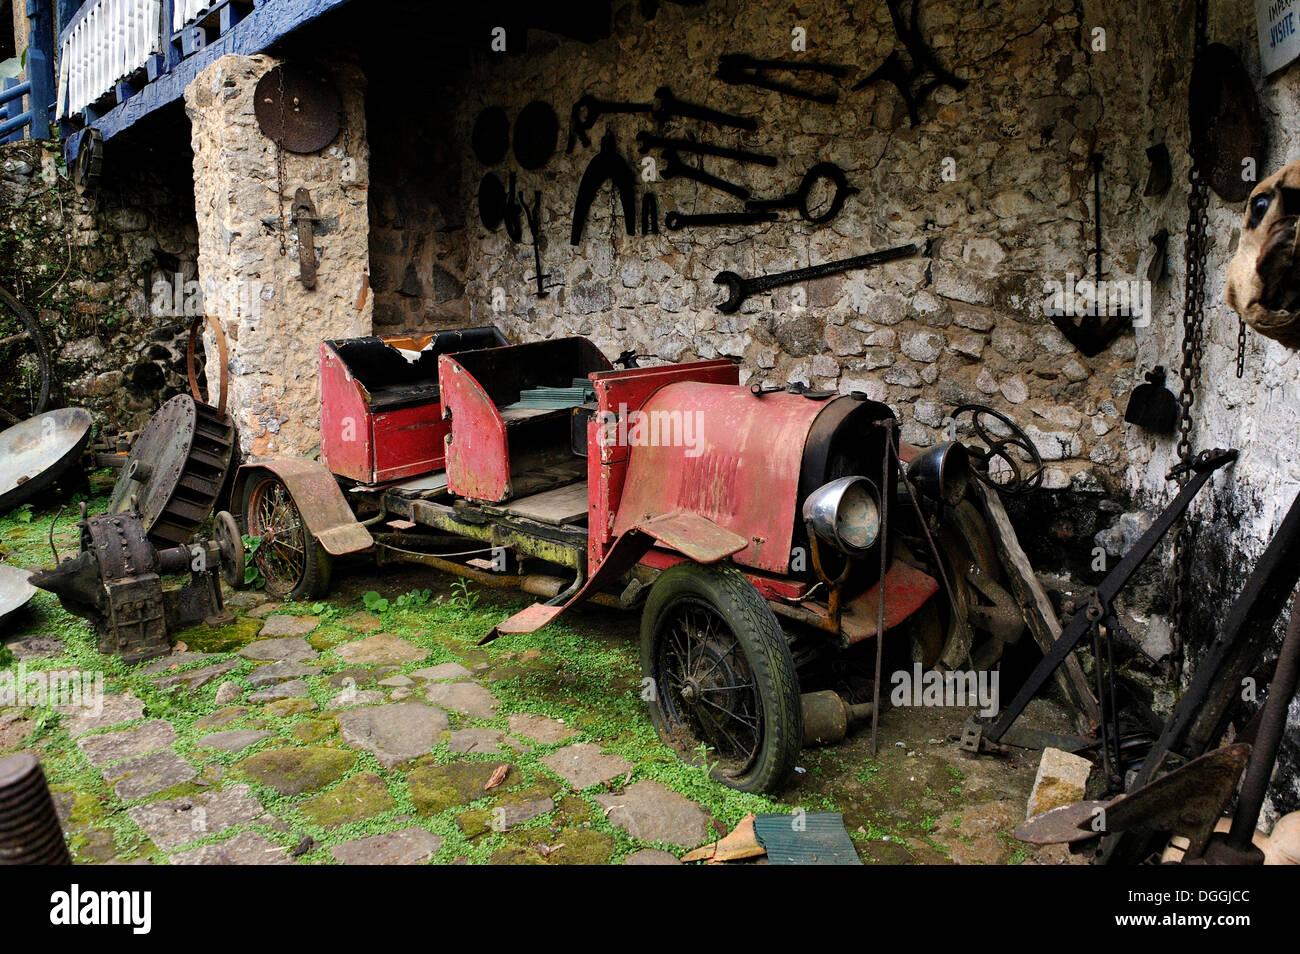 Scrap car, vintage car on the dilapidated Muricana farmyard near Paraty or Parati, Costa Verde, State of Rio de Janeiro, Brazil - Stock Image